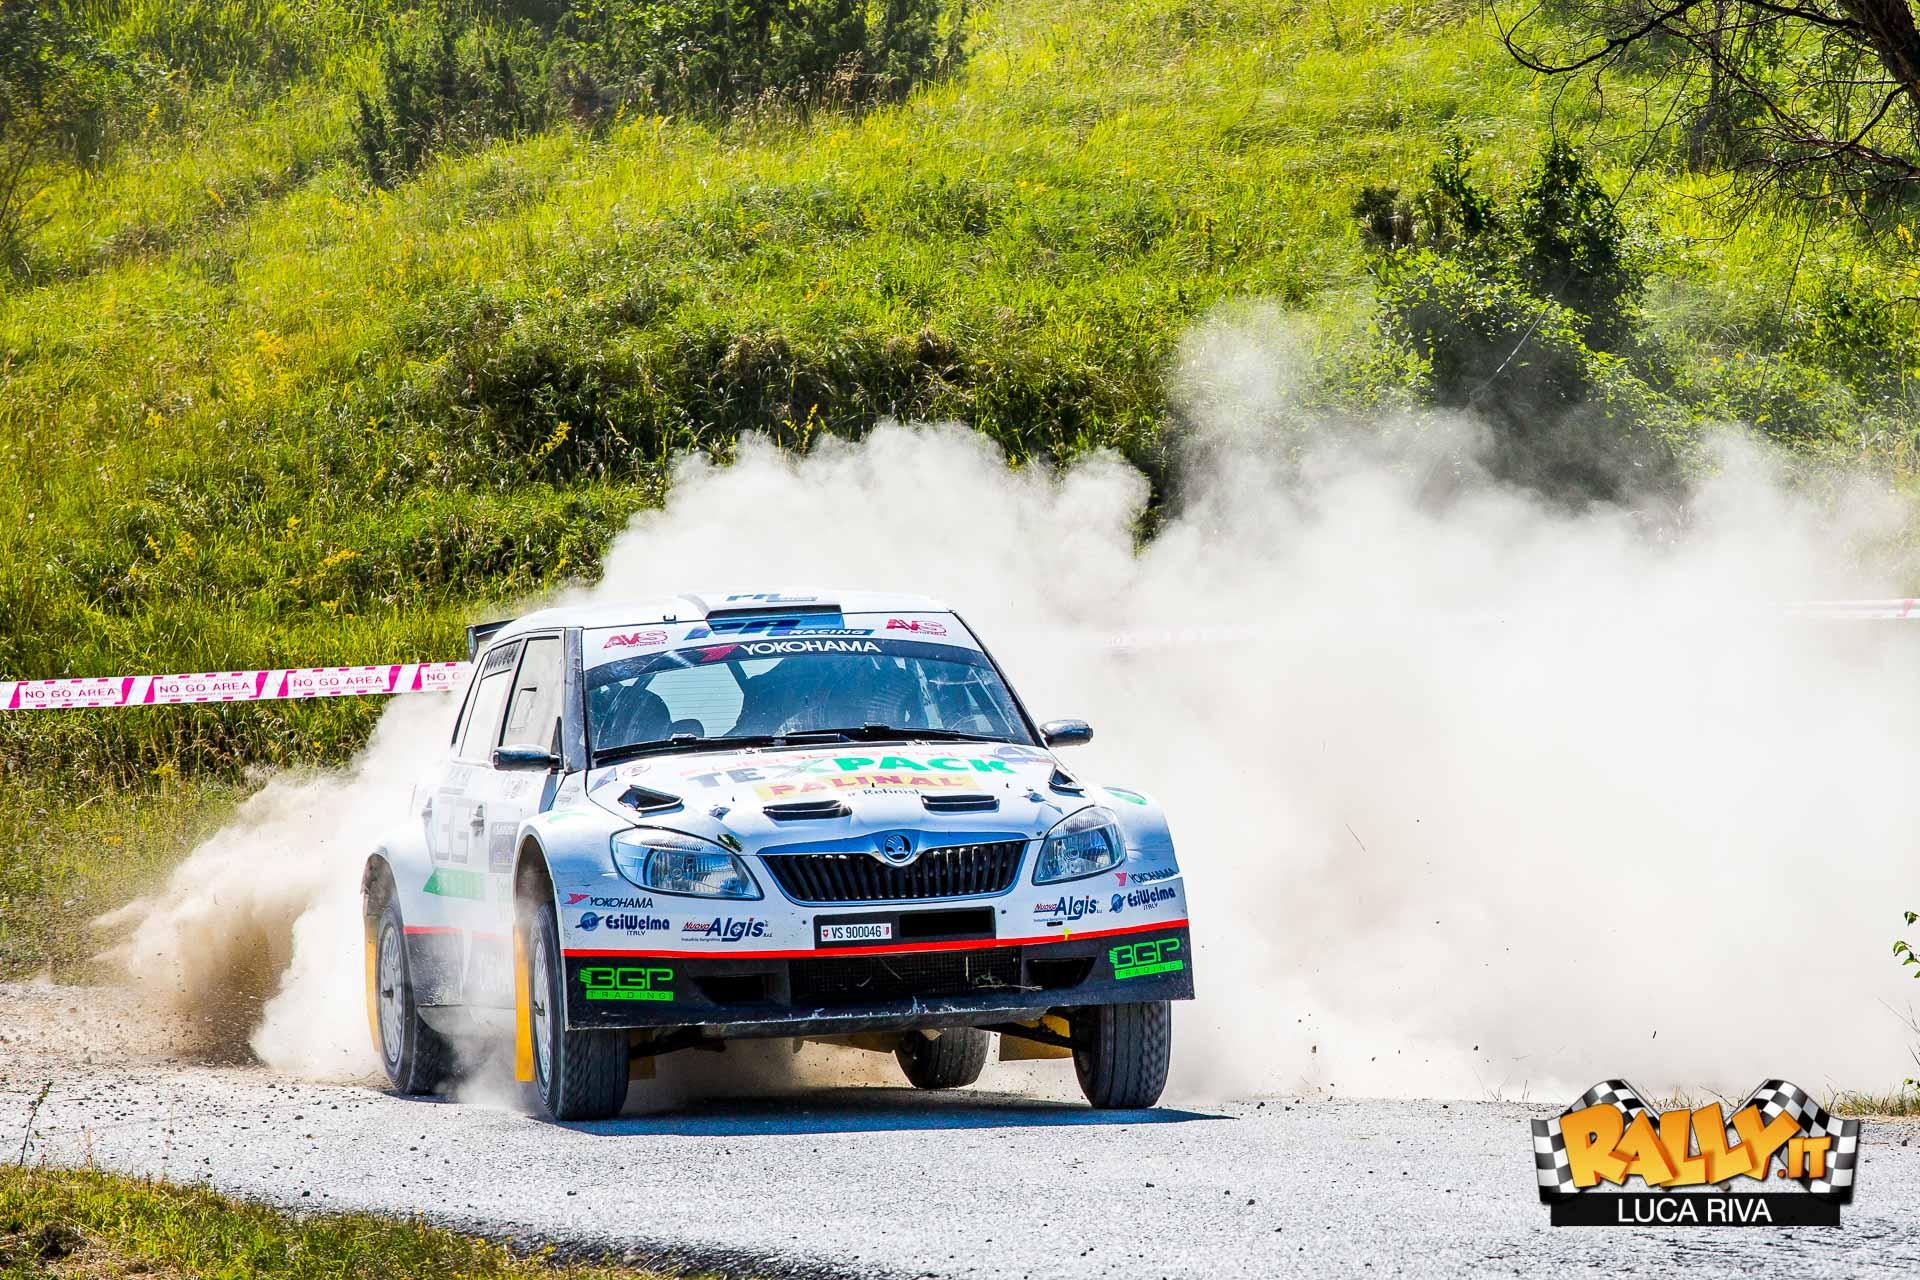 LucaRivaStudio-RallySanMarino2015-b-30.jpg